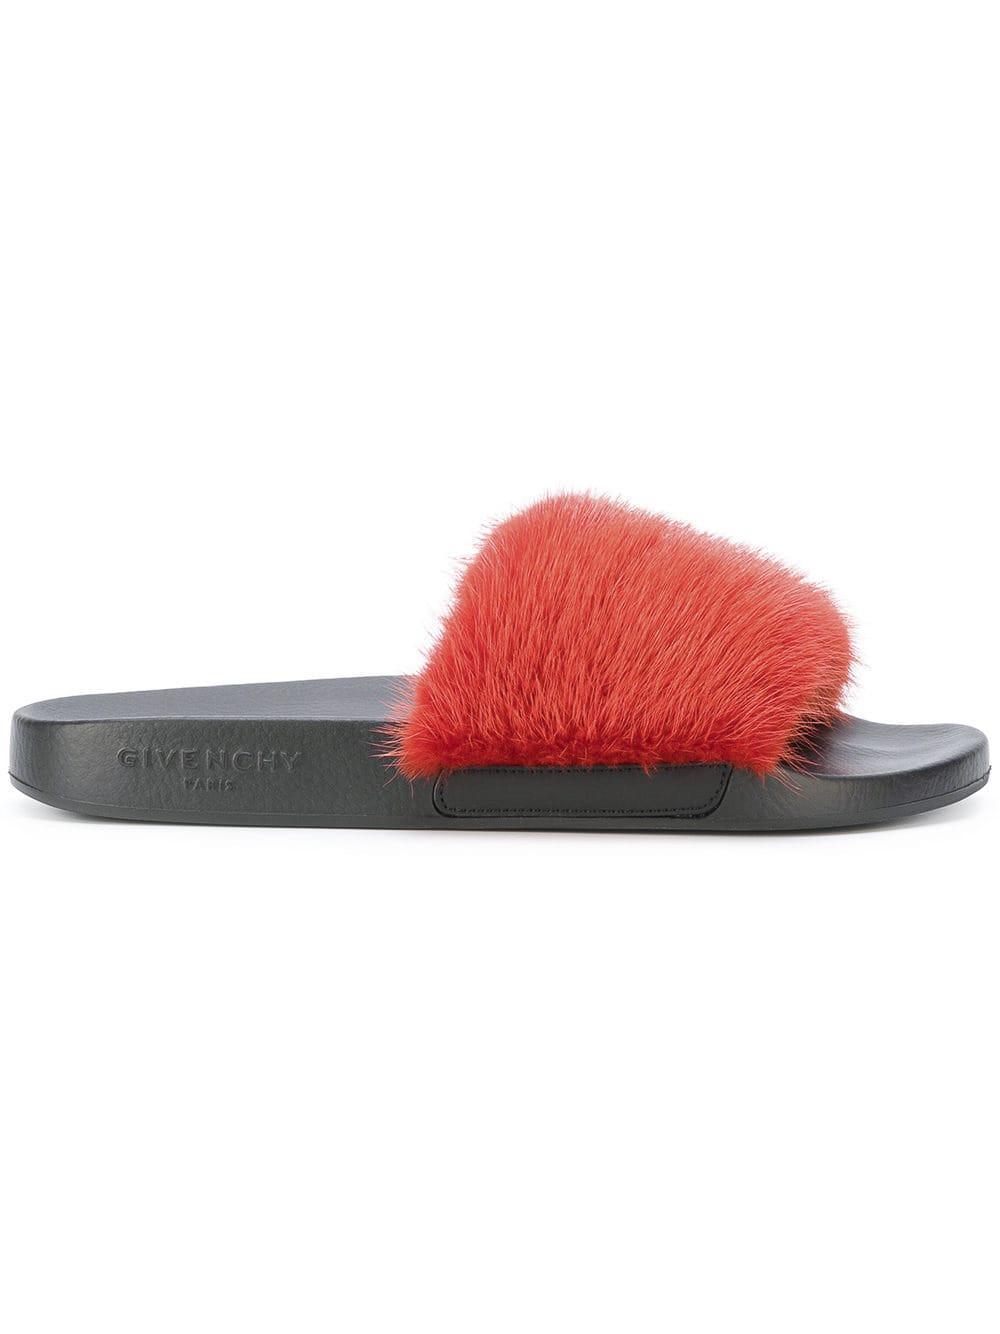 b1c2e6edd49 Givenchy - Red Fur Strap Slides - Lyst. View fullscreen